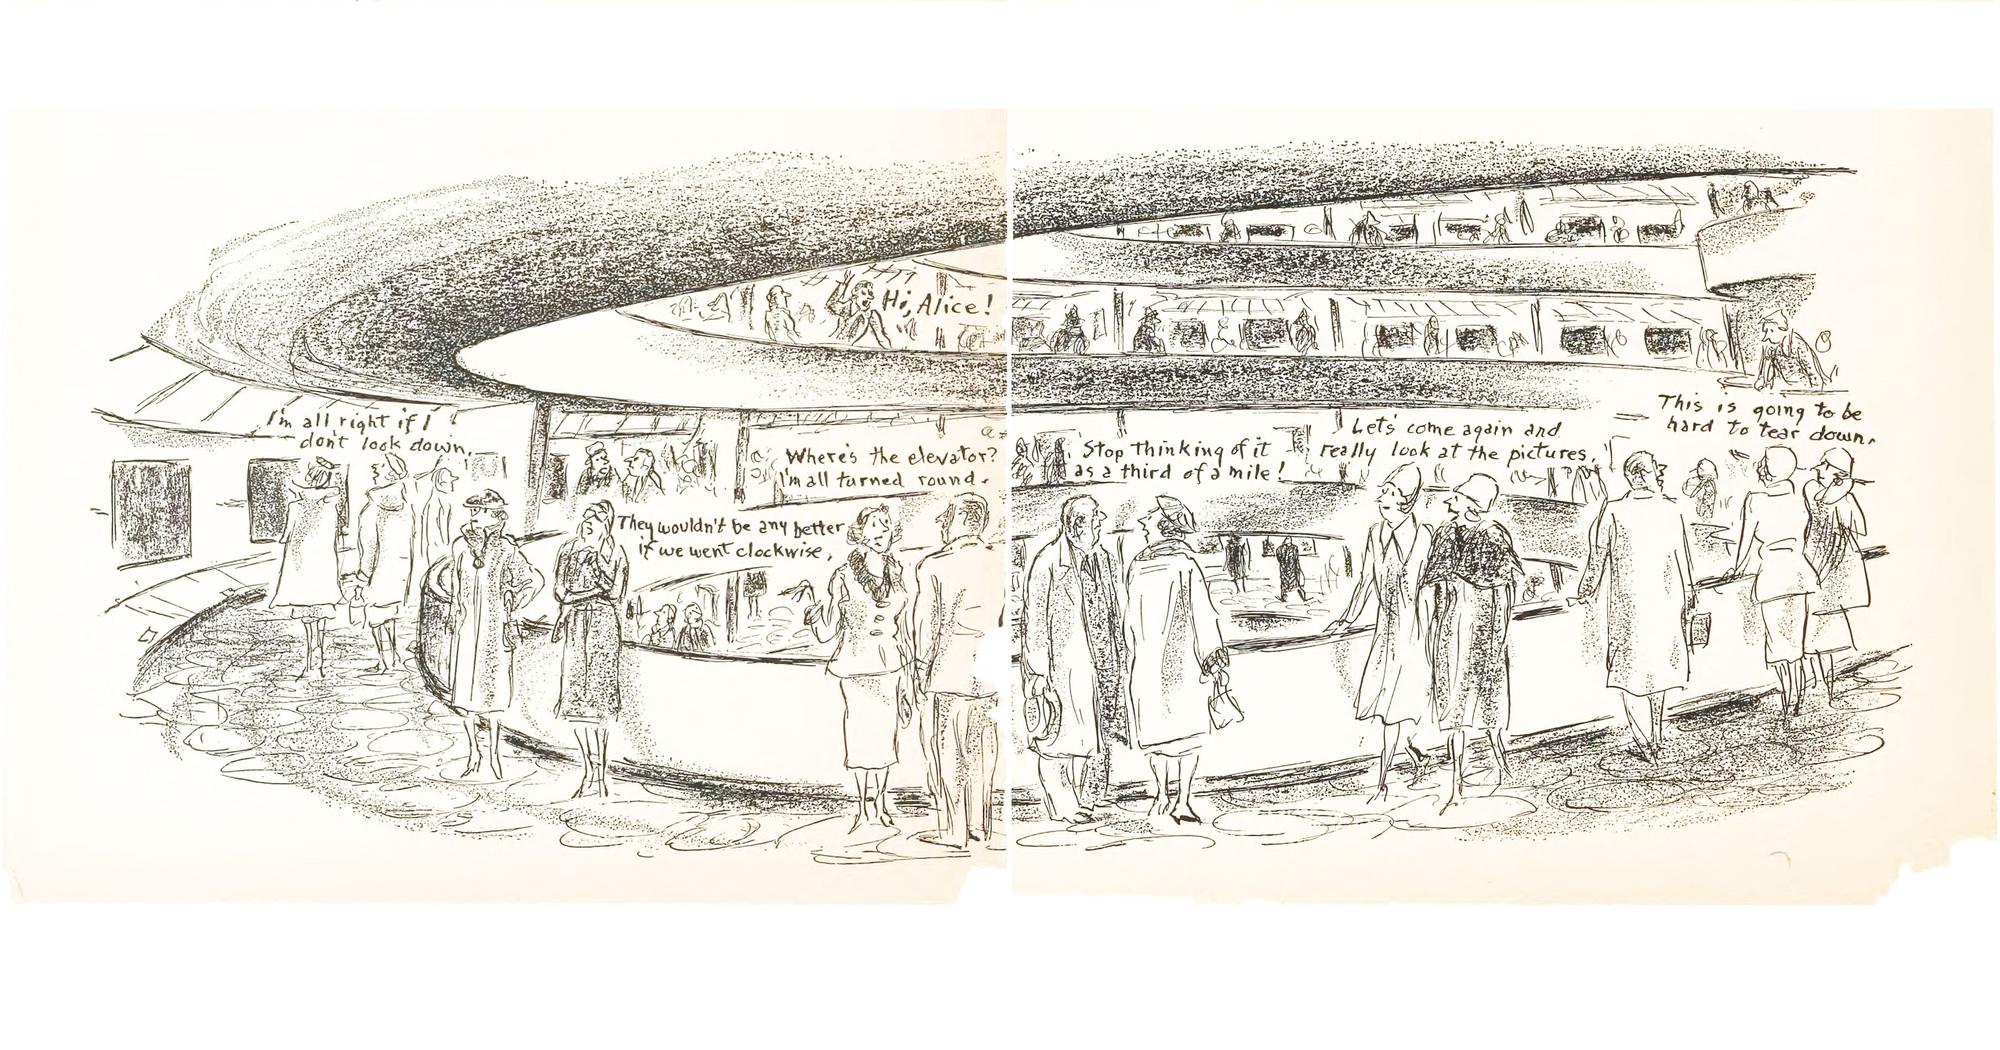 Checklist-newyorkercartoon-1959-opening-page2